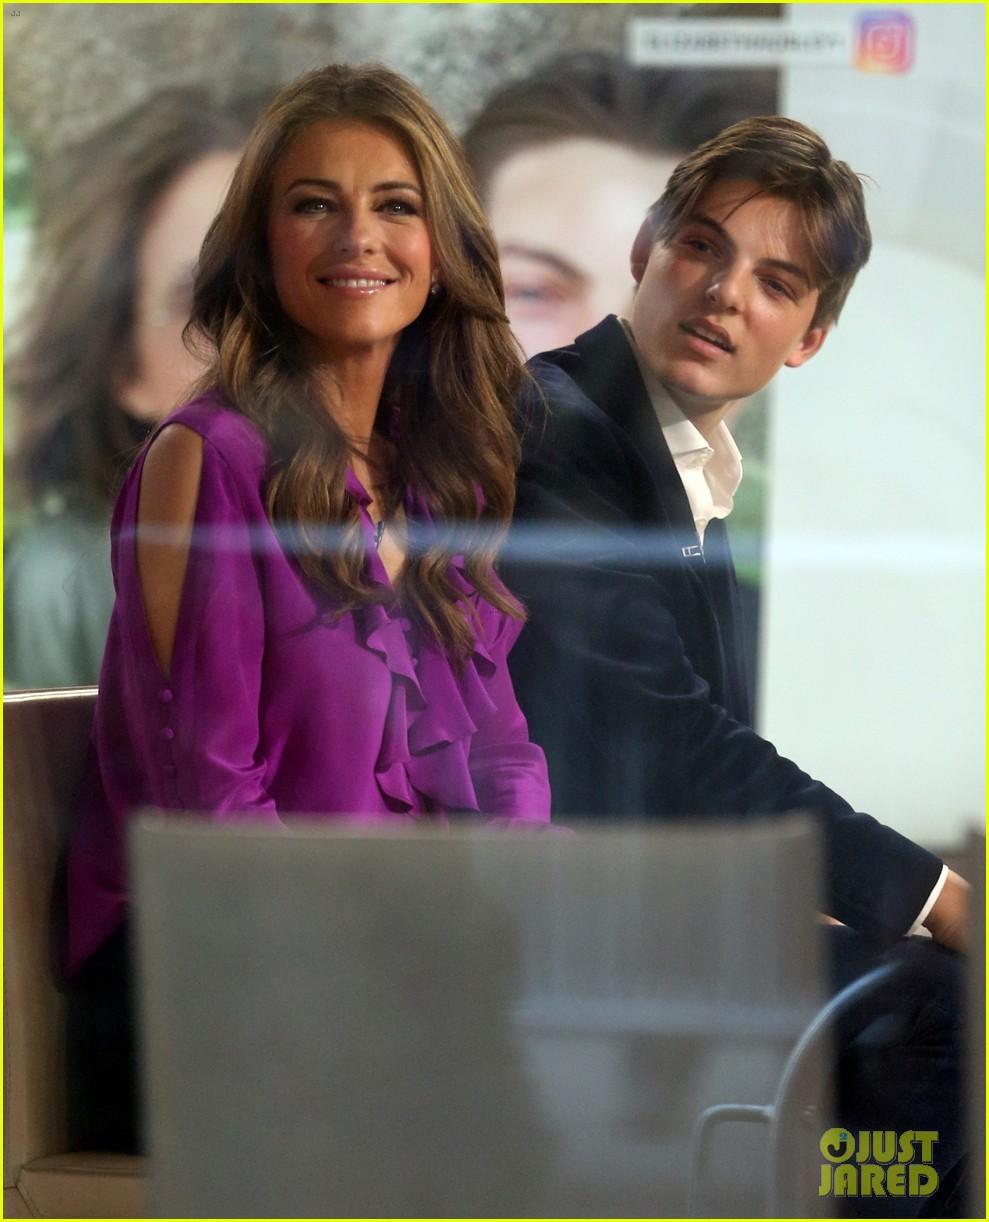 Elizabeth Hurley Praises Son Damian's Debut on 'The Royals': Photo 3830410  | Celebrity Babies, Damian Hurley, Elizabeth Hurley, The Royals Pictures